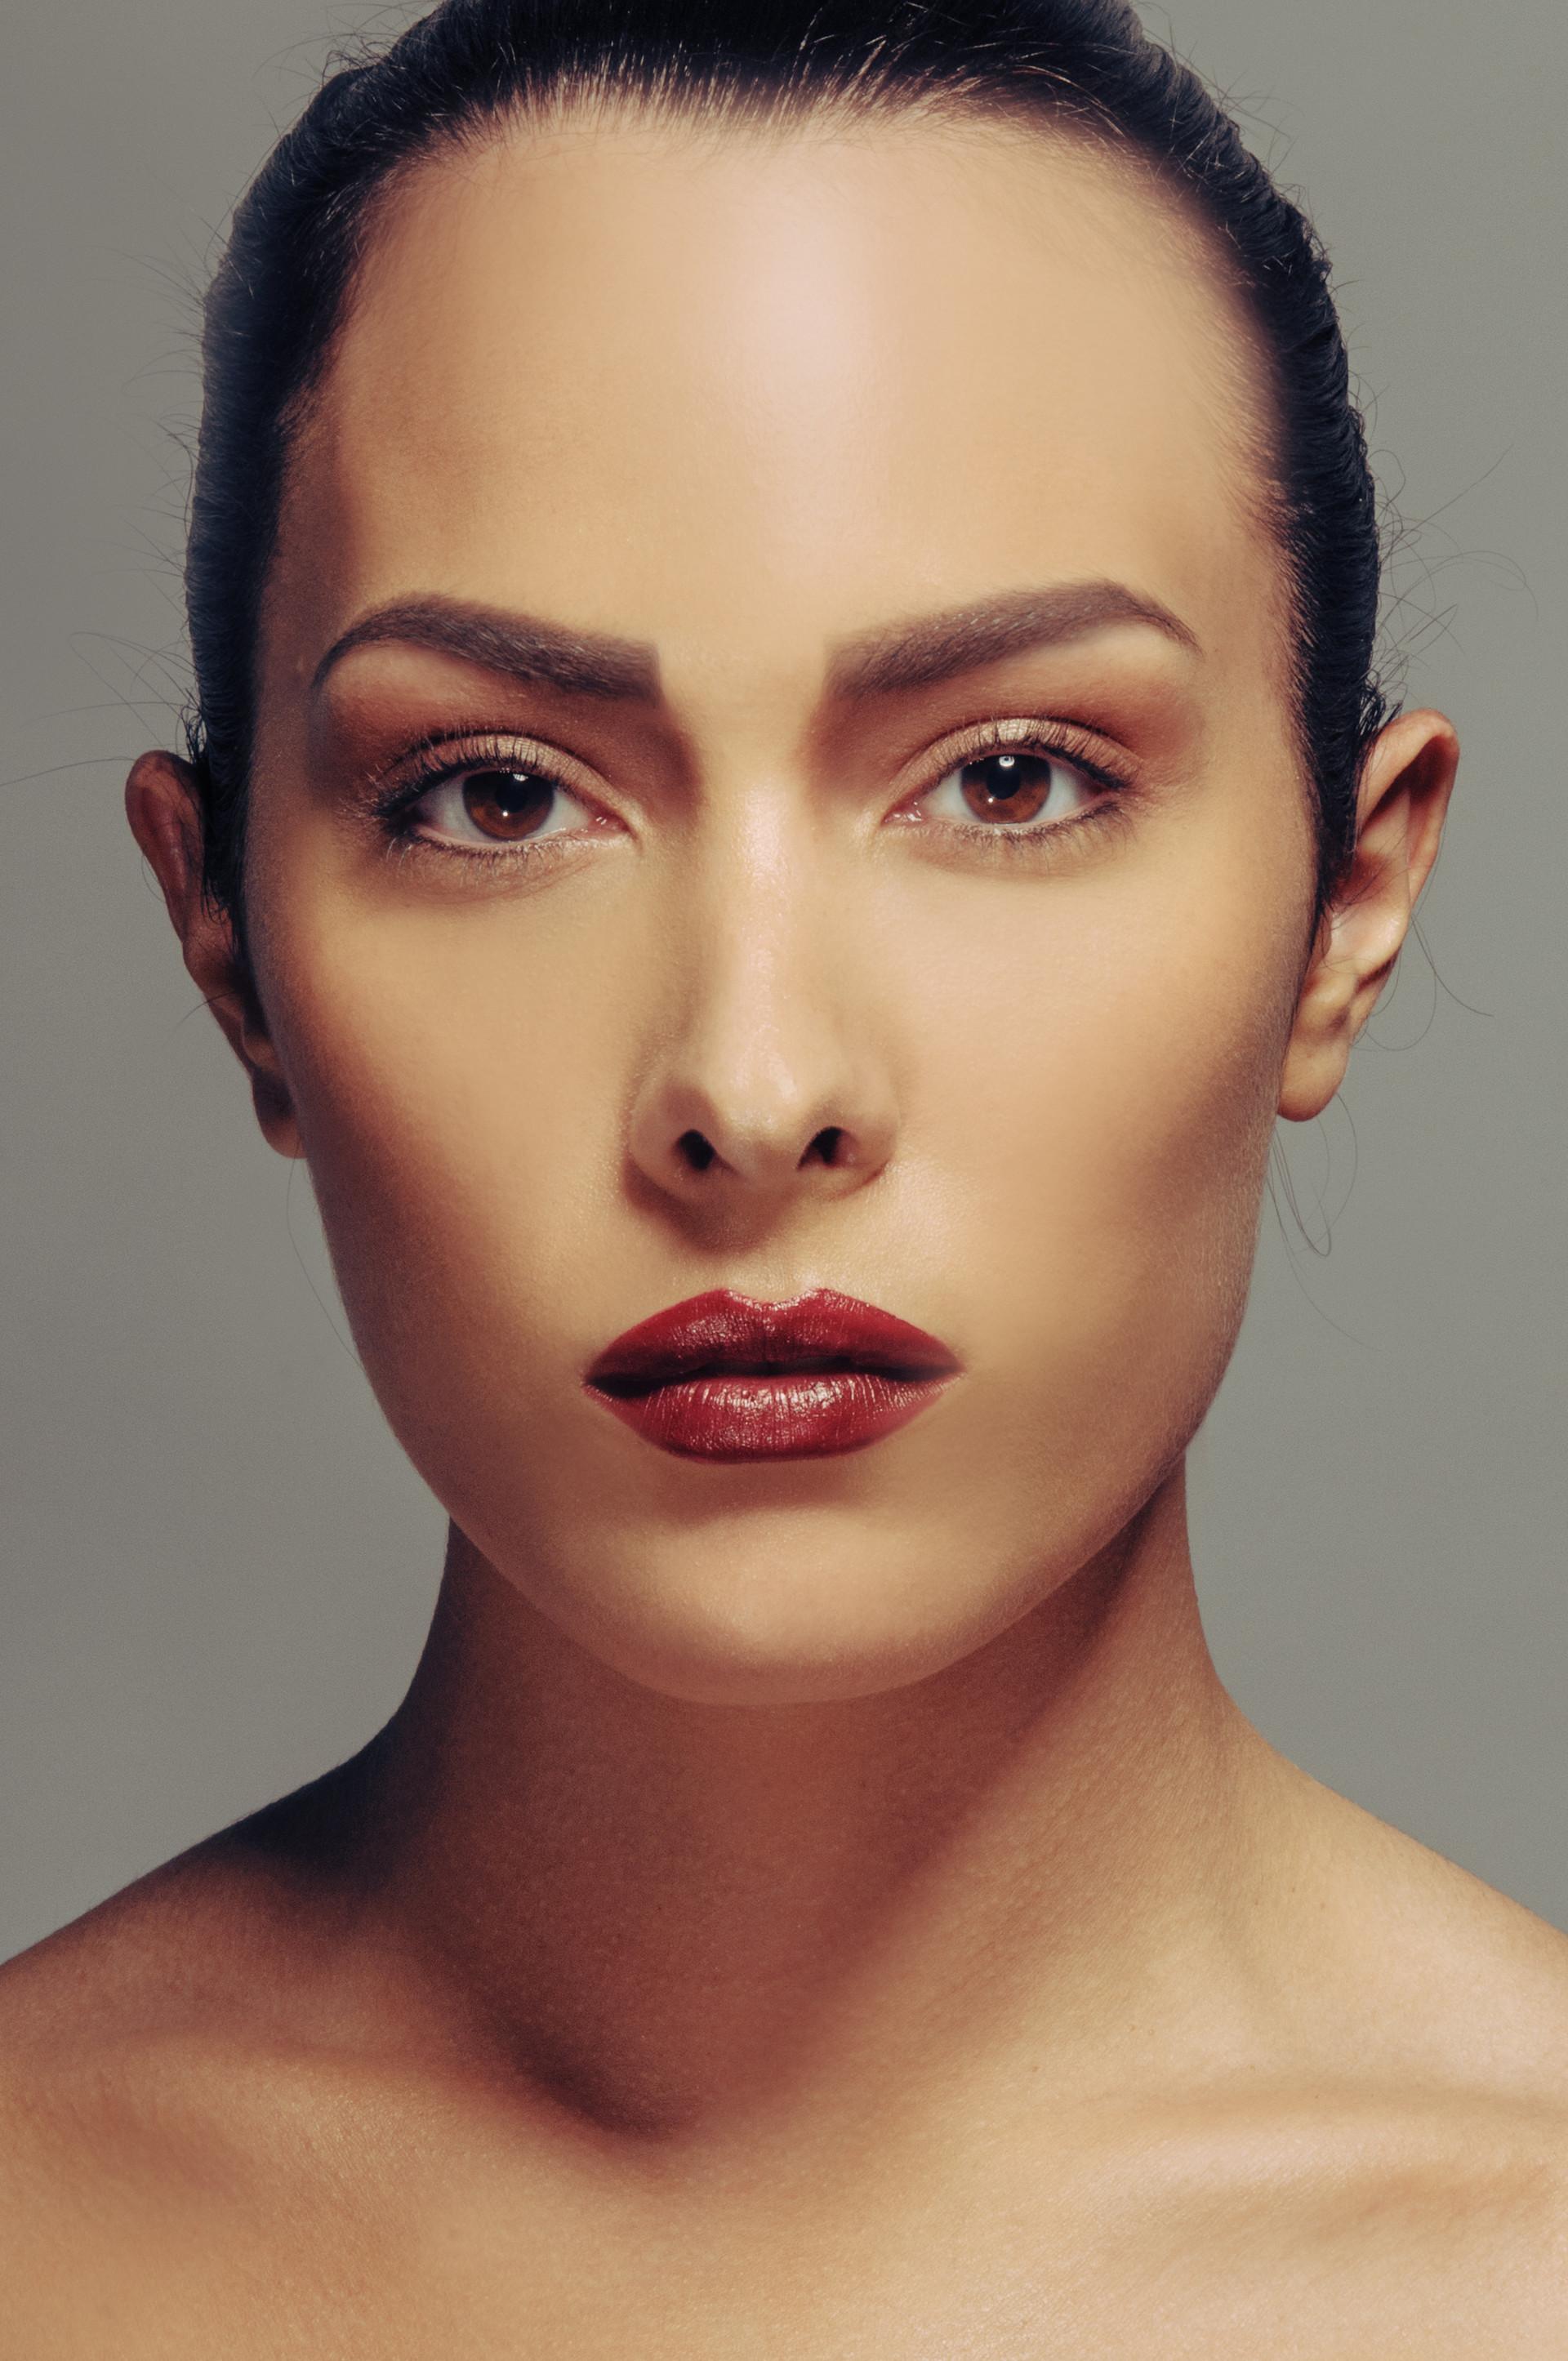 Photo: Martin Janssen Make-up & Hair: Jeanette Waasdorp